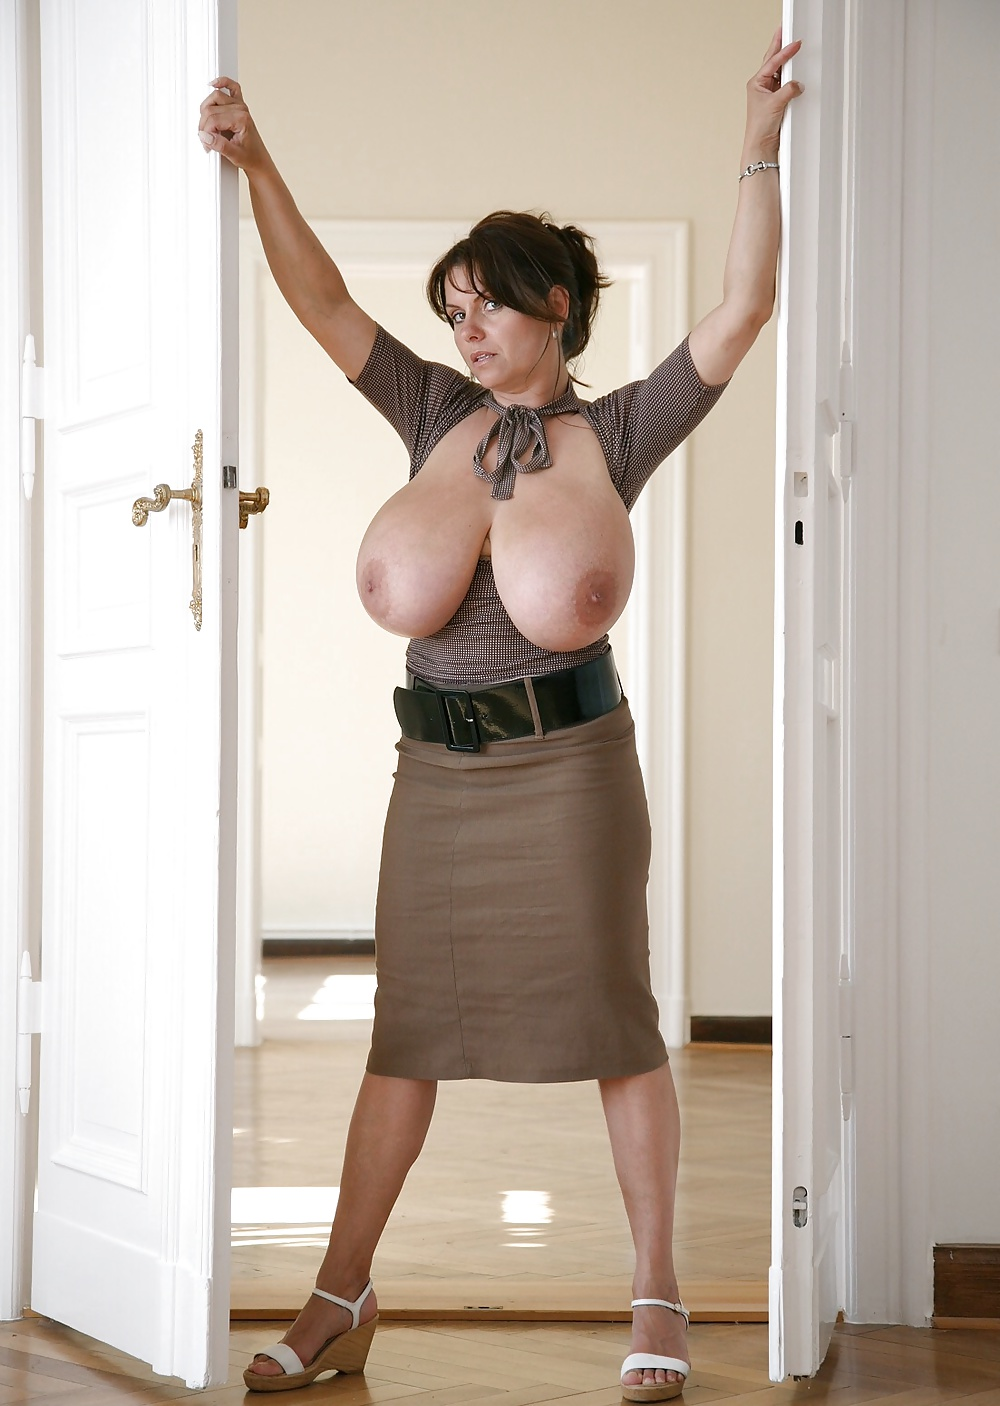 Unfaithful british milf gill ellis displays her massive breasts